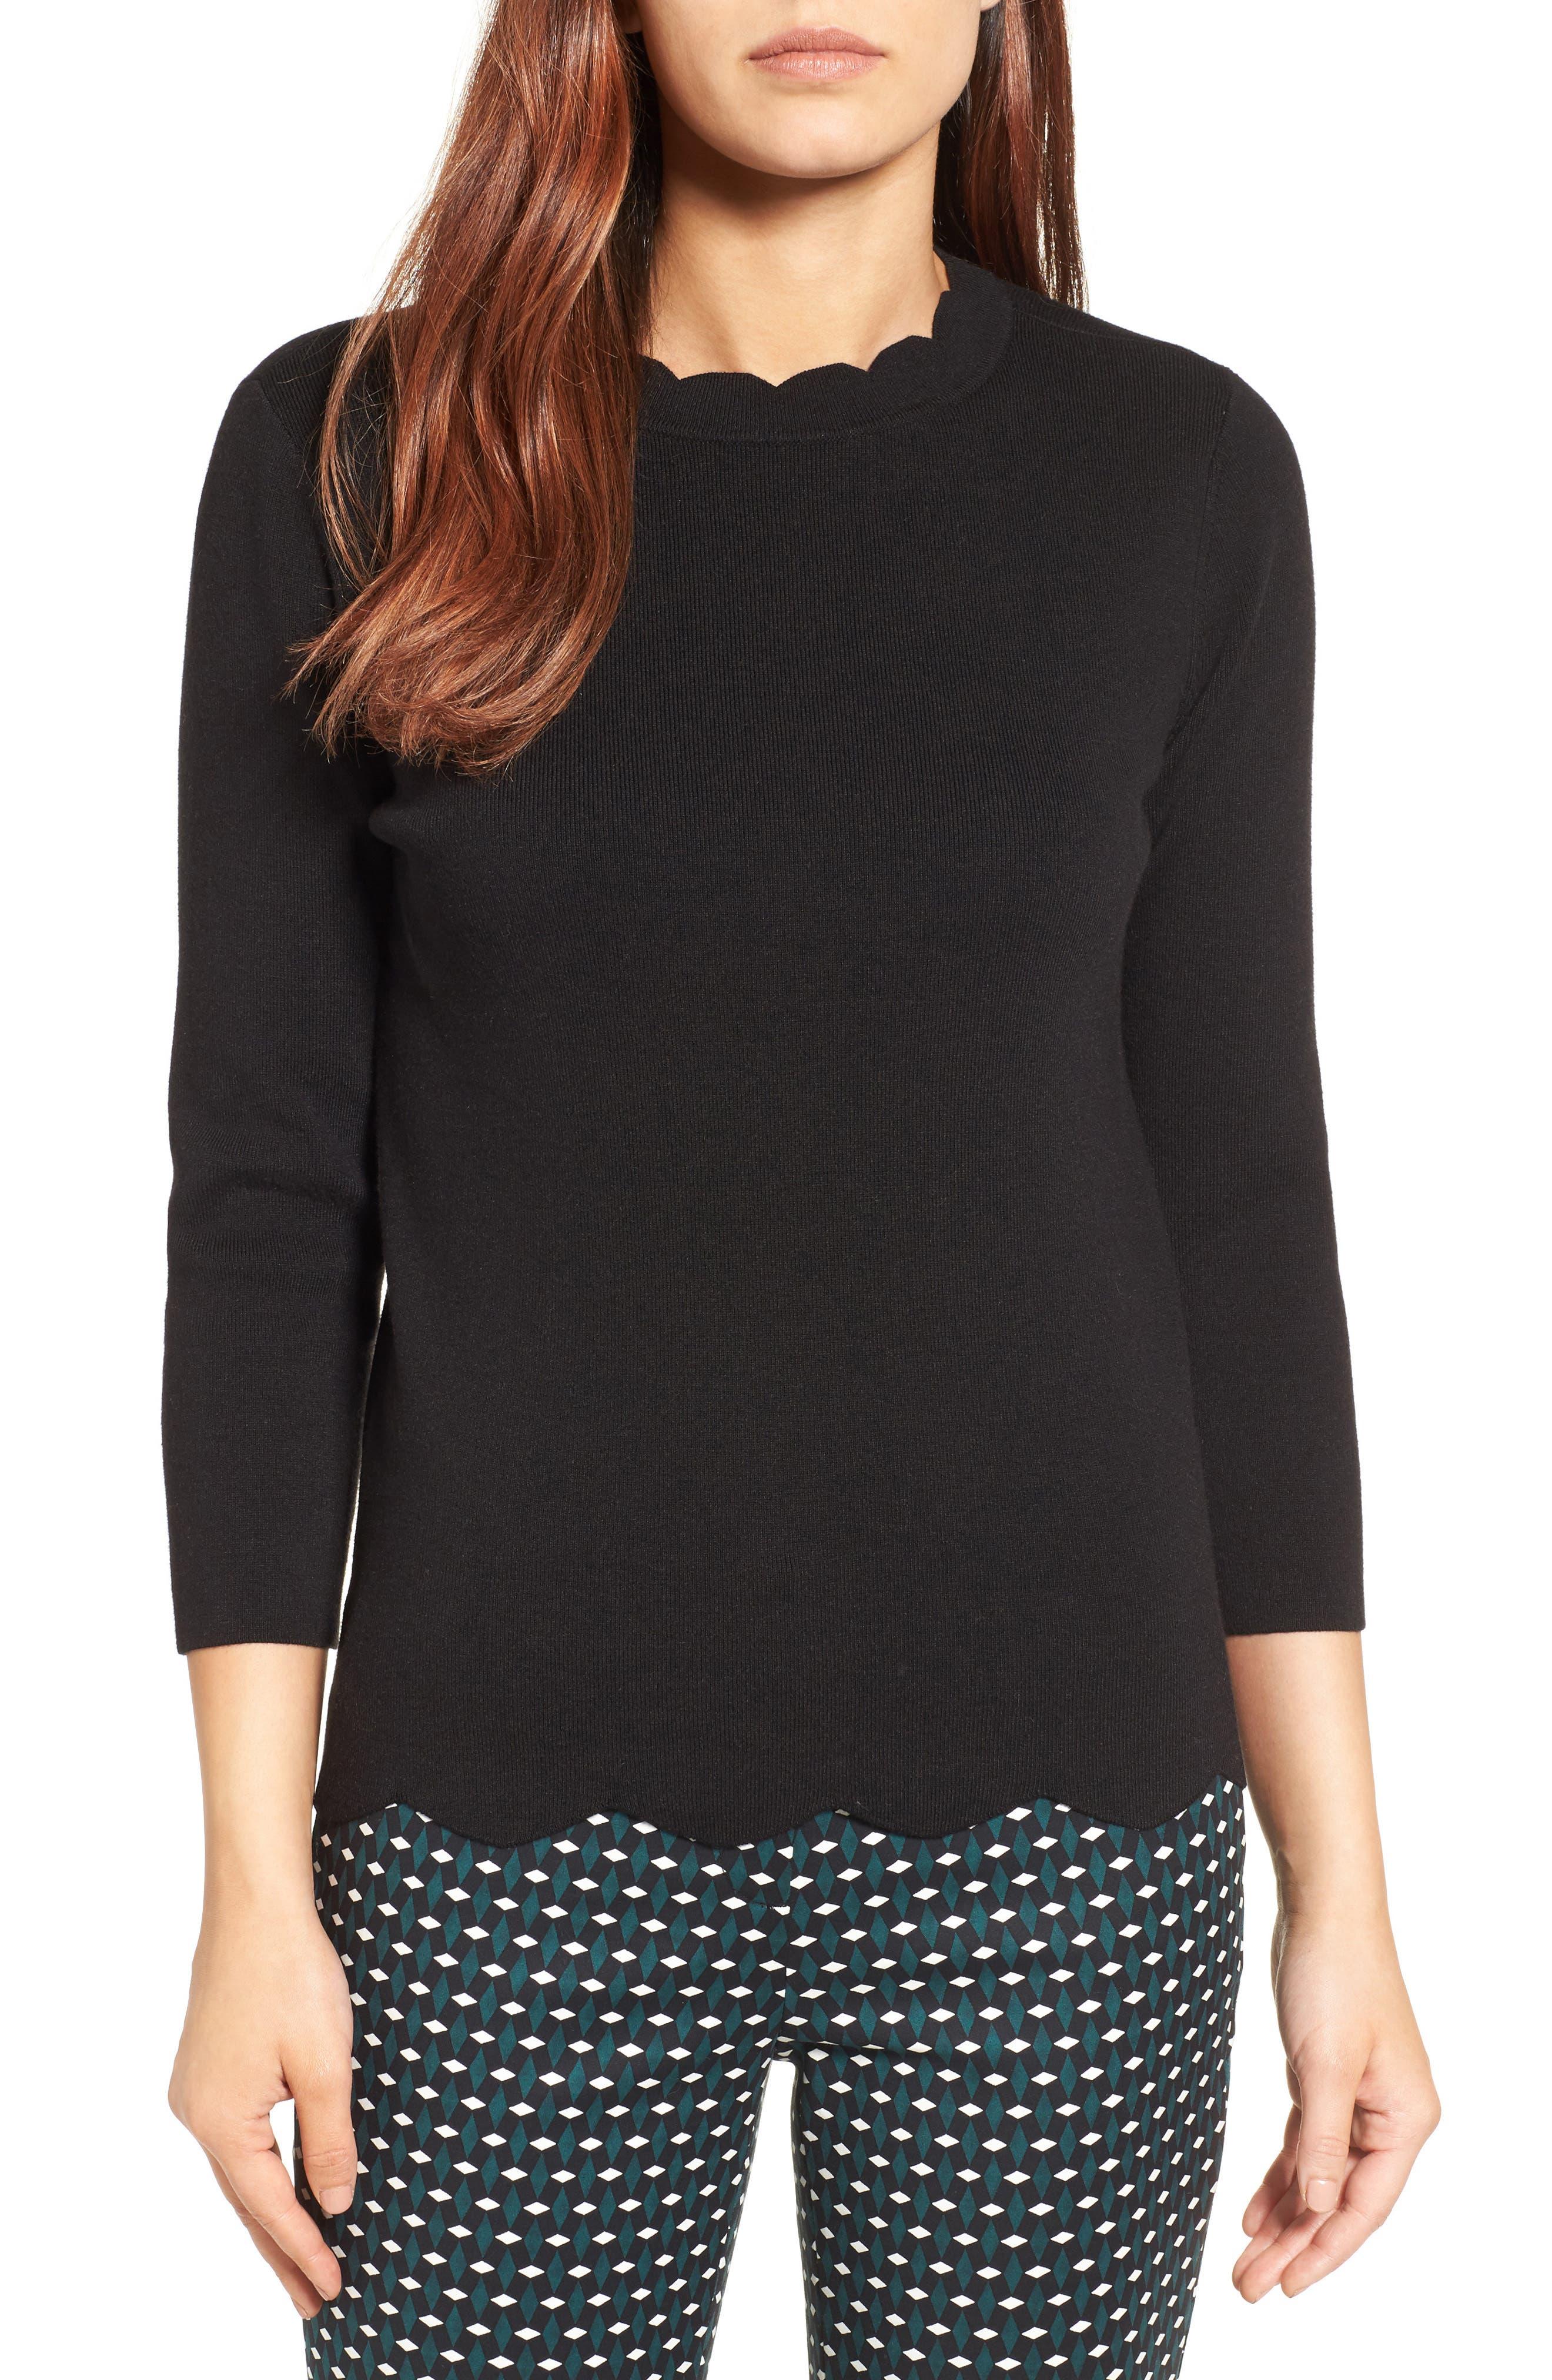 3/4 Sleeve Sweaters & Sweatshirts, Cowl Necks, Cable Knits ...